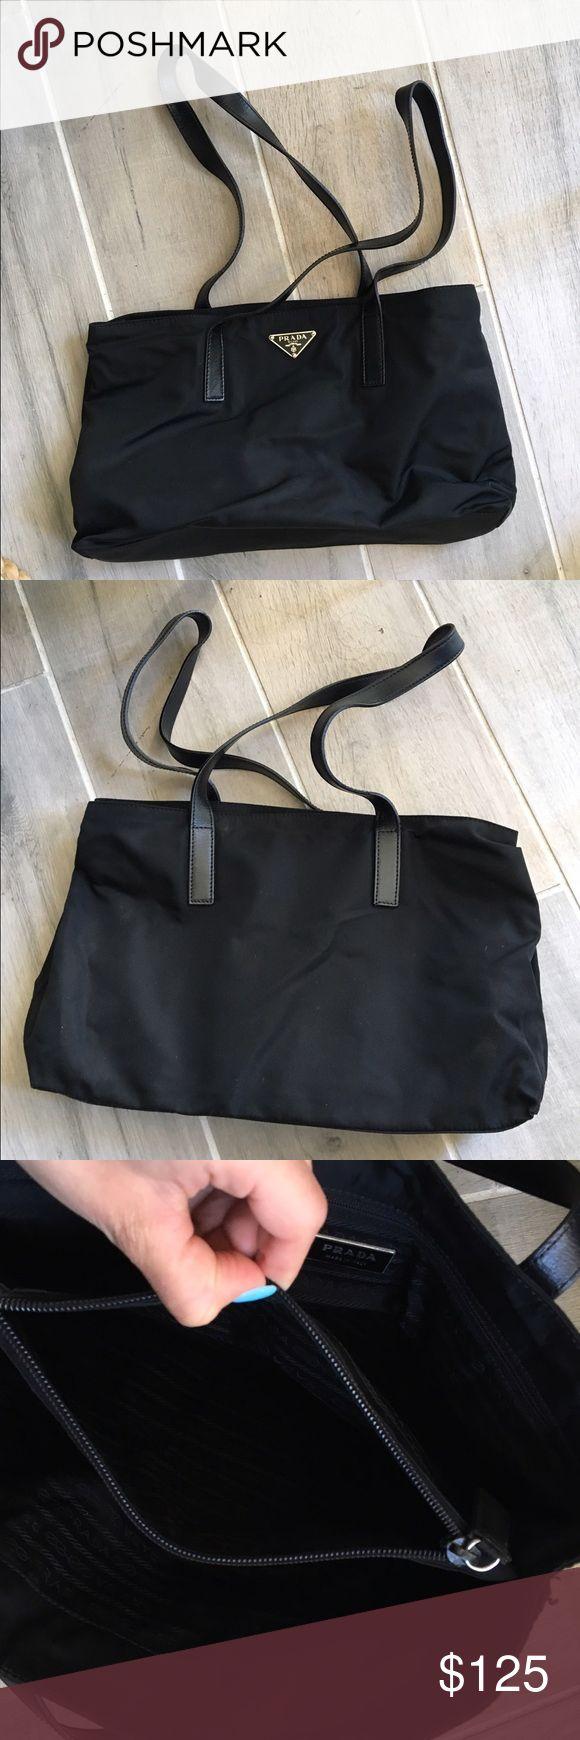 🎉2 HOUR SALE🎉 PRADA SMALL BLACK PURSE Authentic. Prada Bags Mini Bags